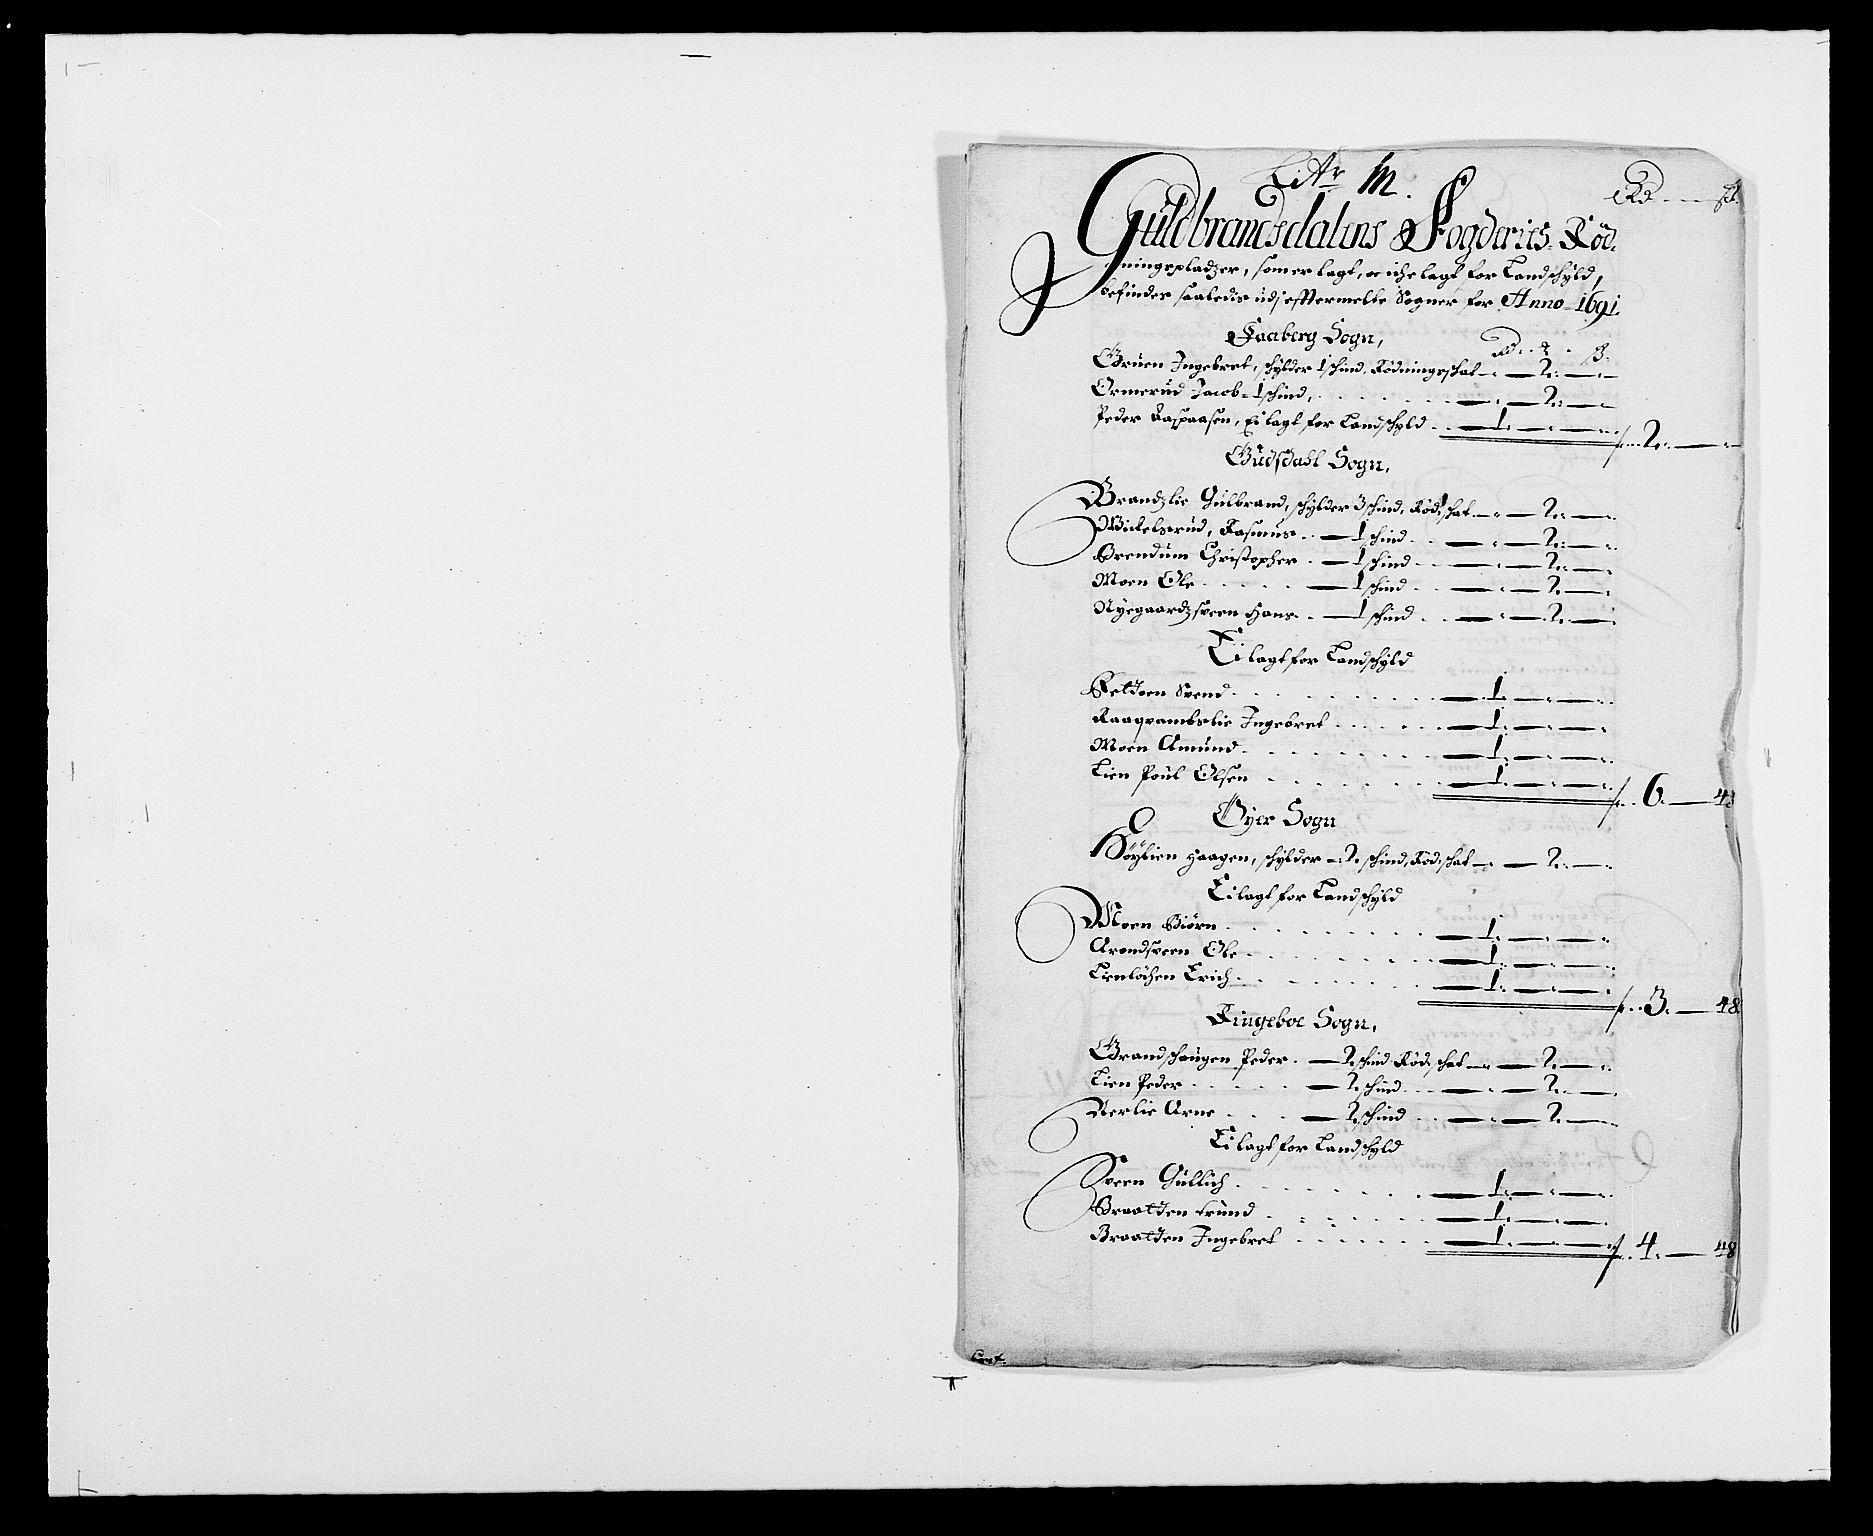 RA, Rentekammeret inntil 1814, Reviderte regnskaper, Fogderegnskap, R17/L1165: Fogderegnskap Gudbrandsdal, 1690-1692, s. 207